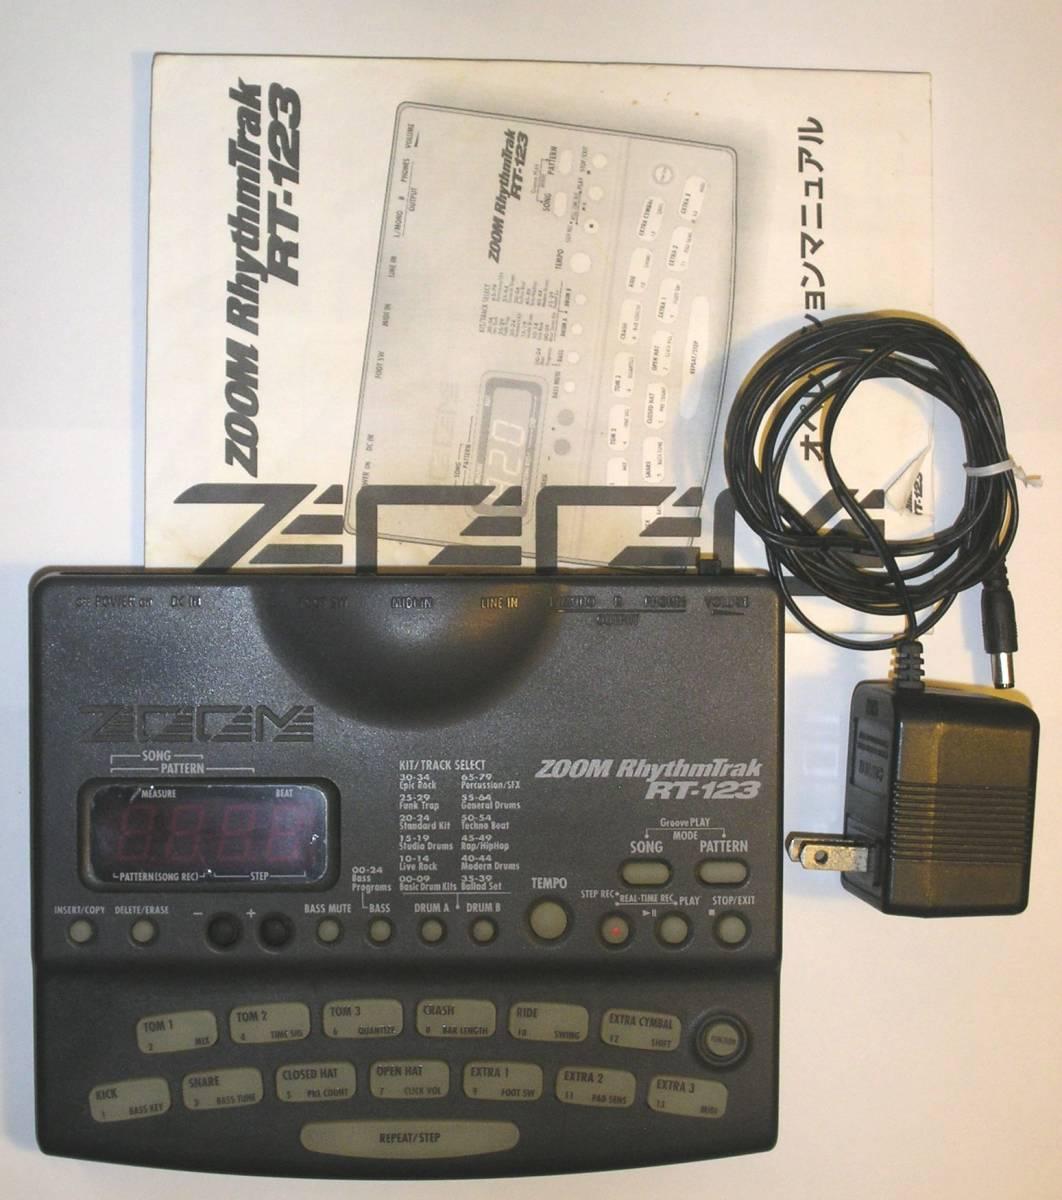 Zoom ズーム RT-123 RhythmTrak 高機能リズムマシン MIDI ACアダプター 取扱説明書 付属